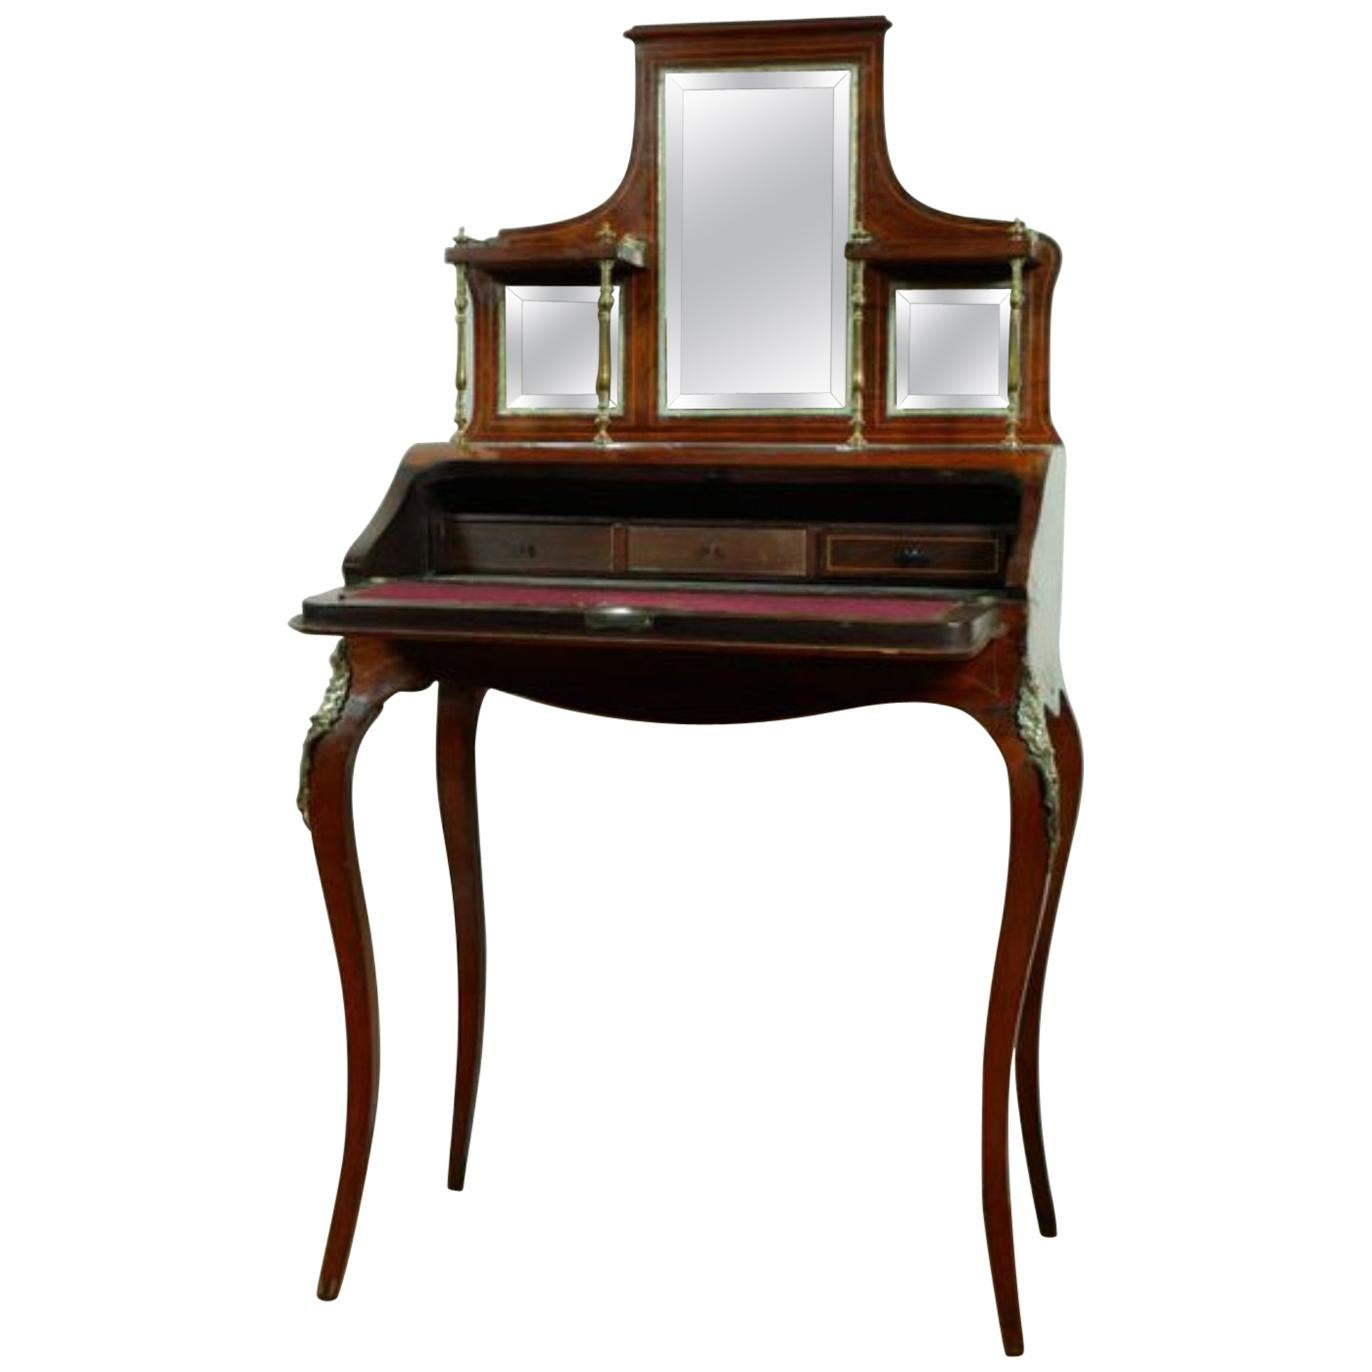 19th Century French Louis XVI Style Mahogany Inlaid Ladies Desk Bonheur Du Jour